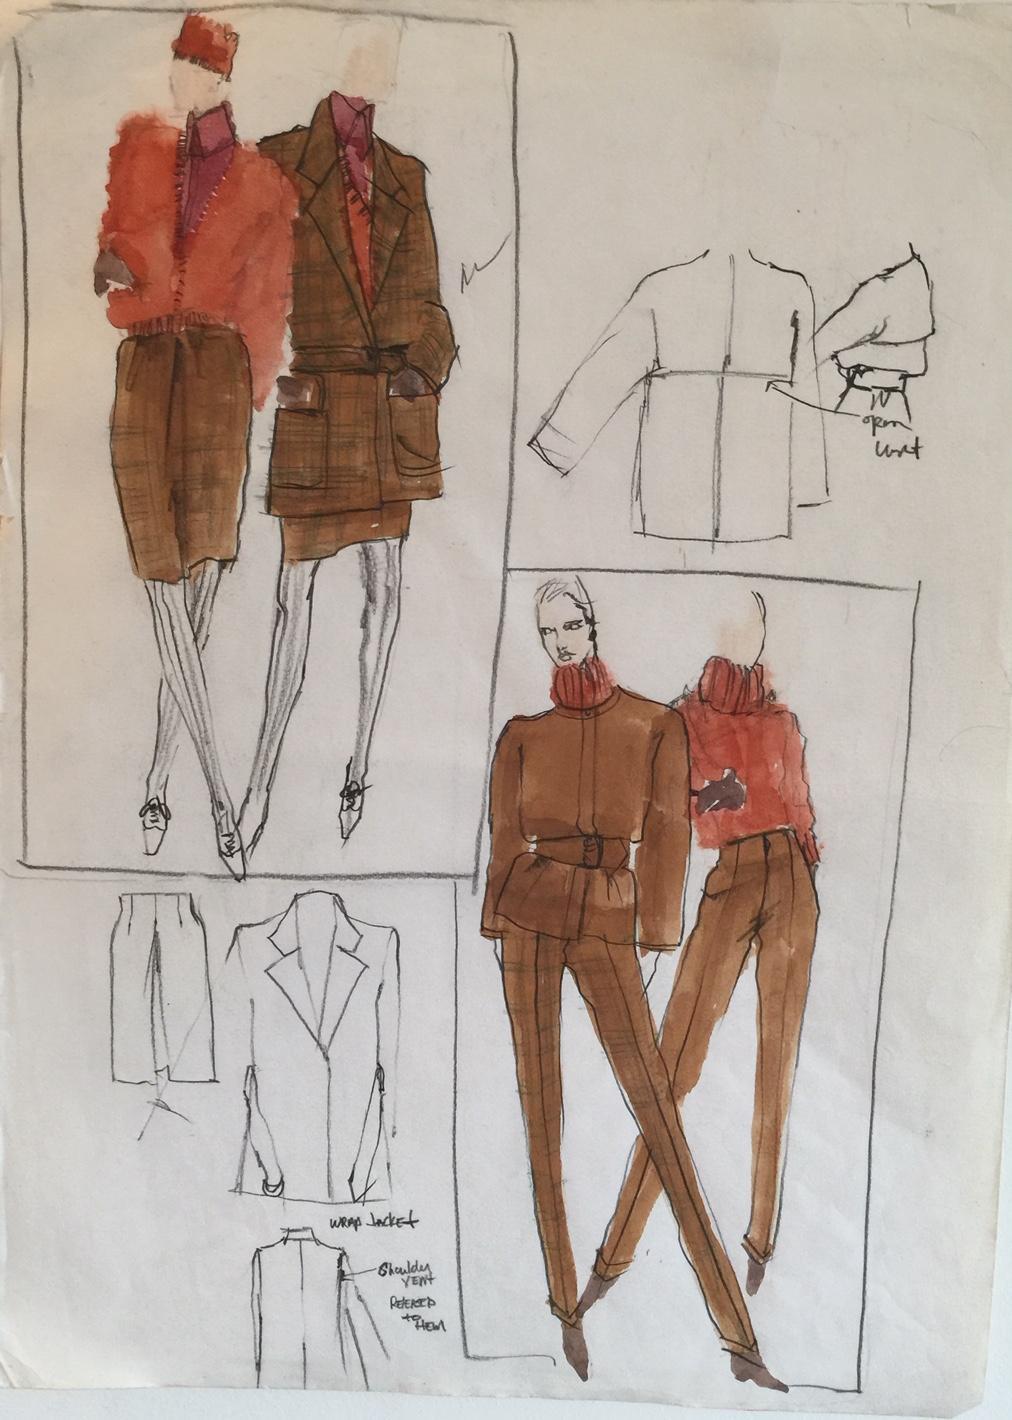 Rare Original Fashion Sketch With Production Notes